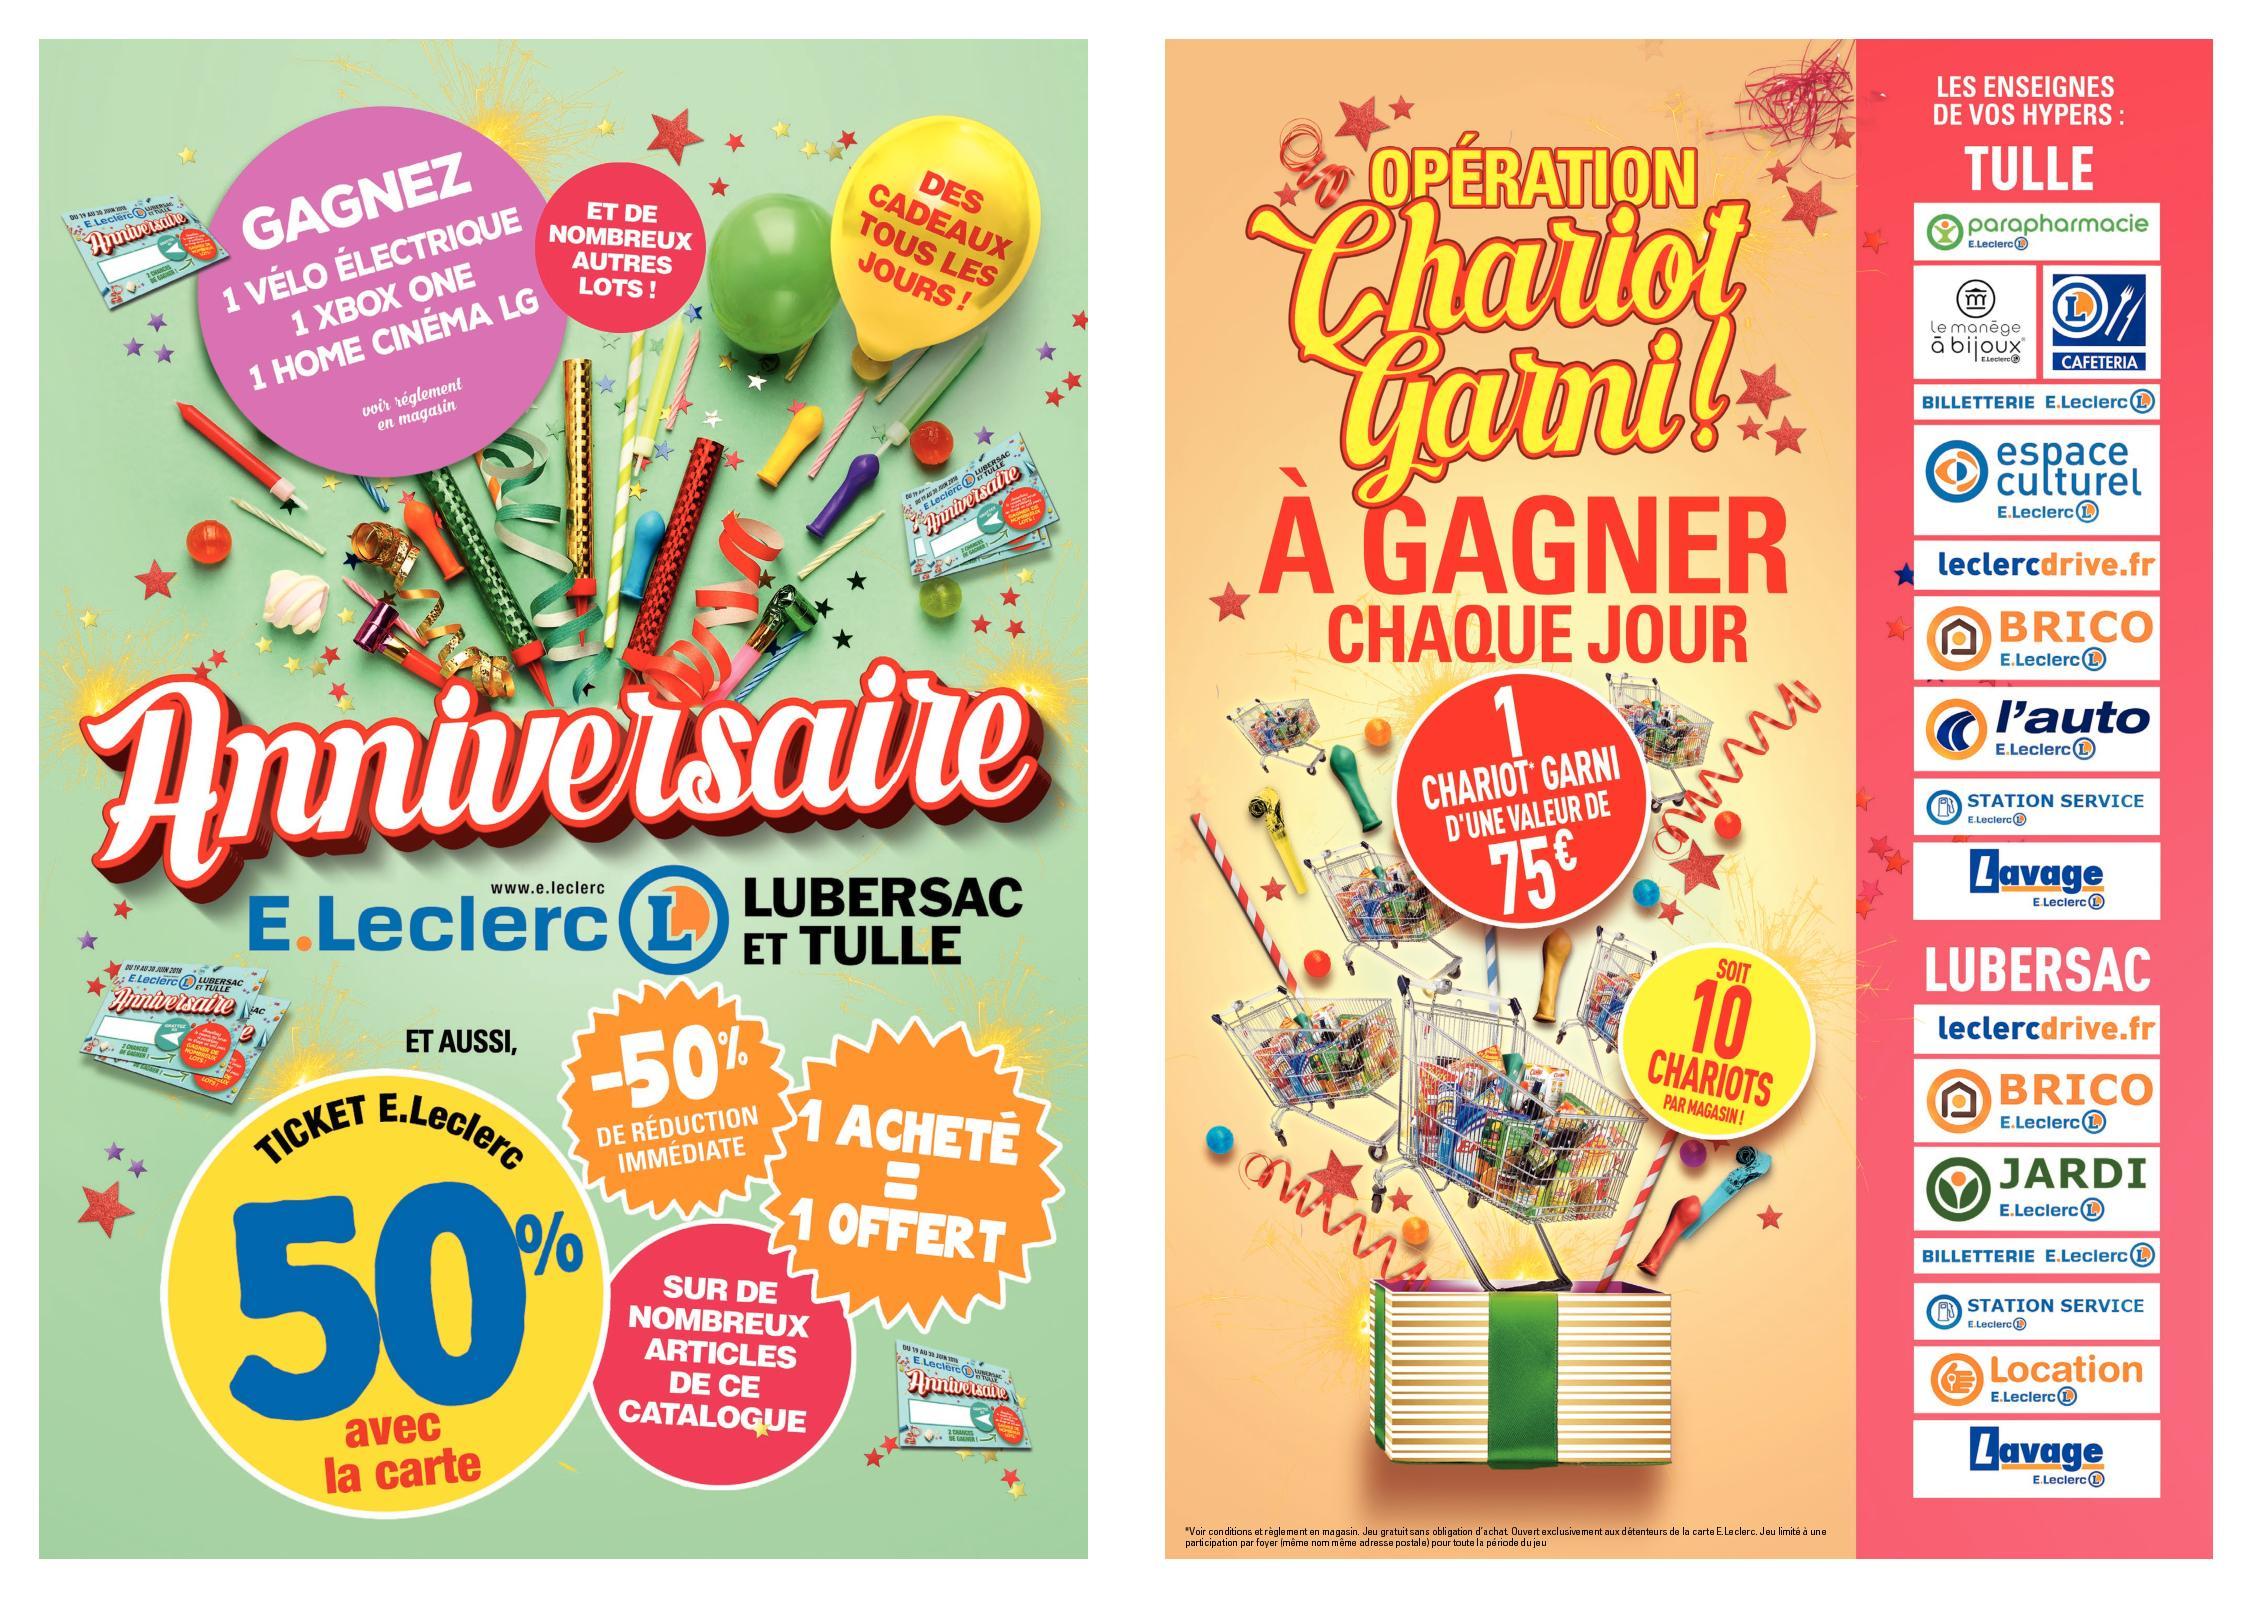 Catalogue Anniversaire Eleclerc Tulle Lubersac Calameo